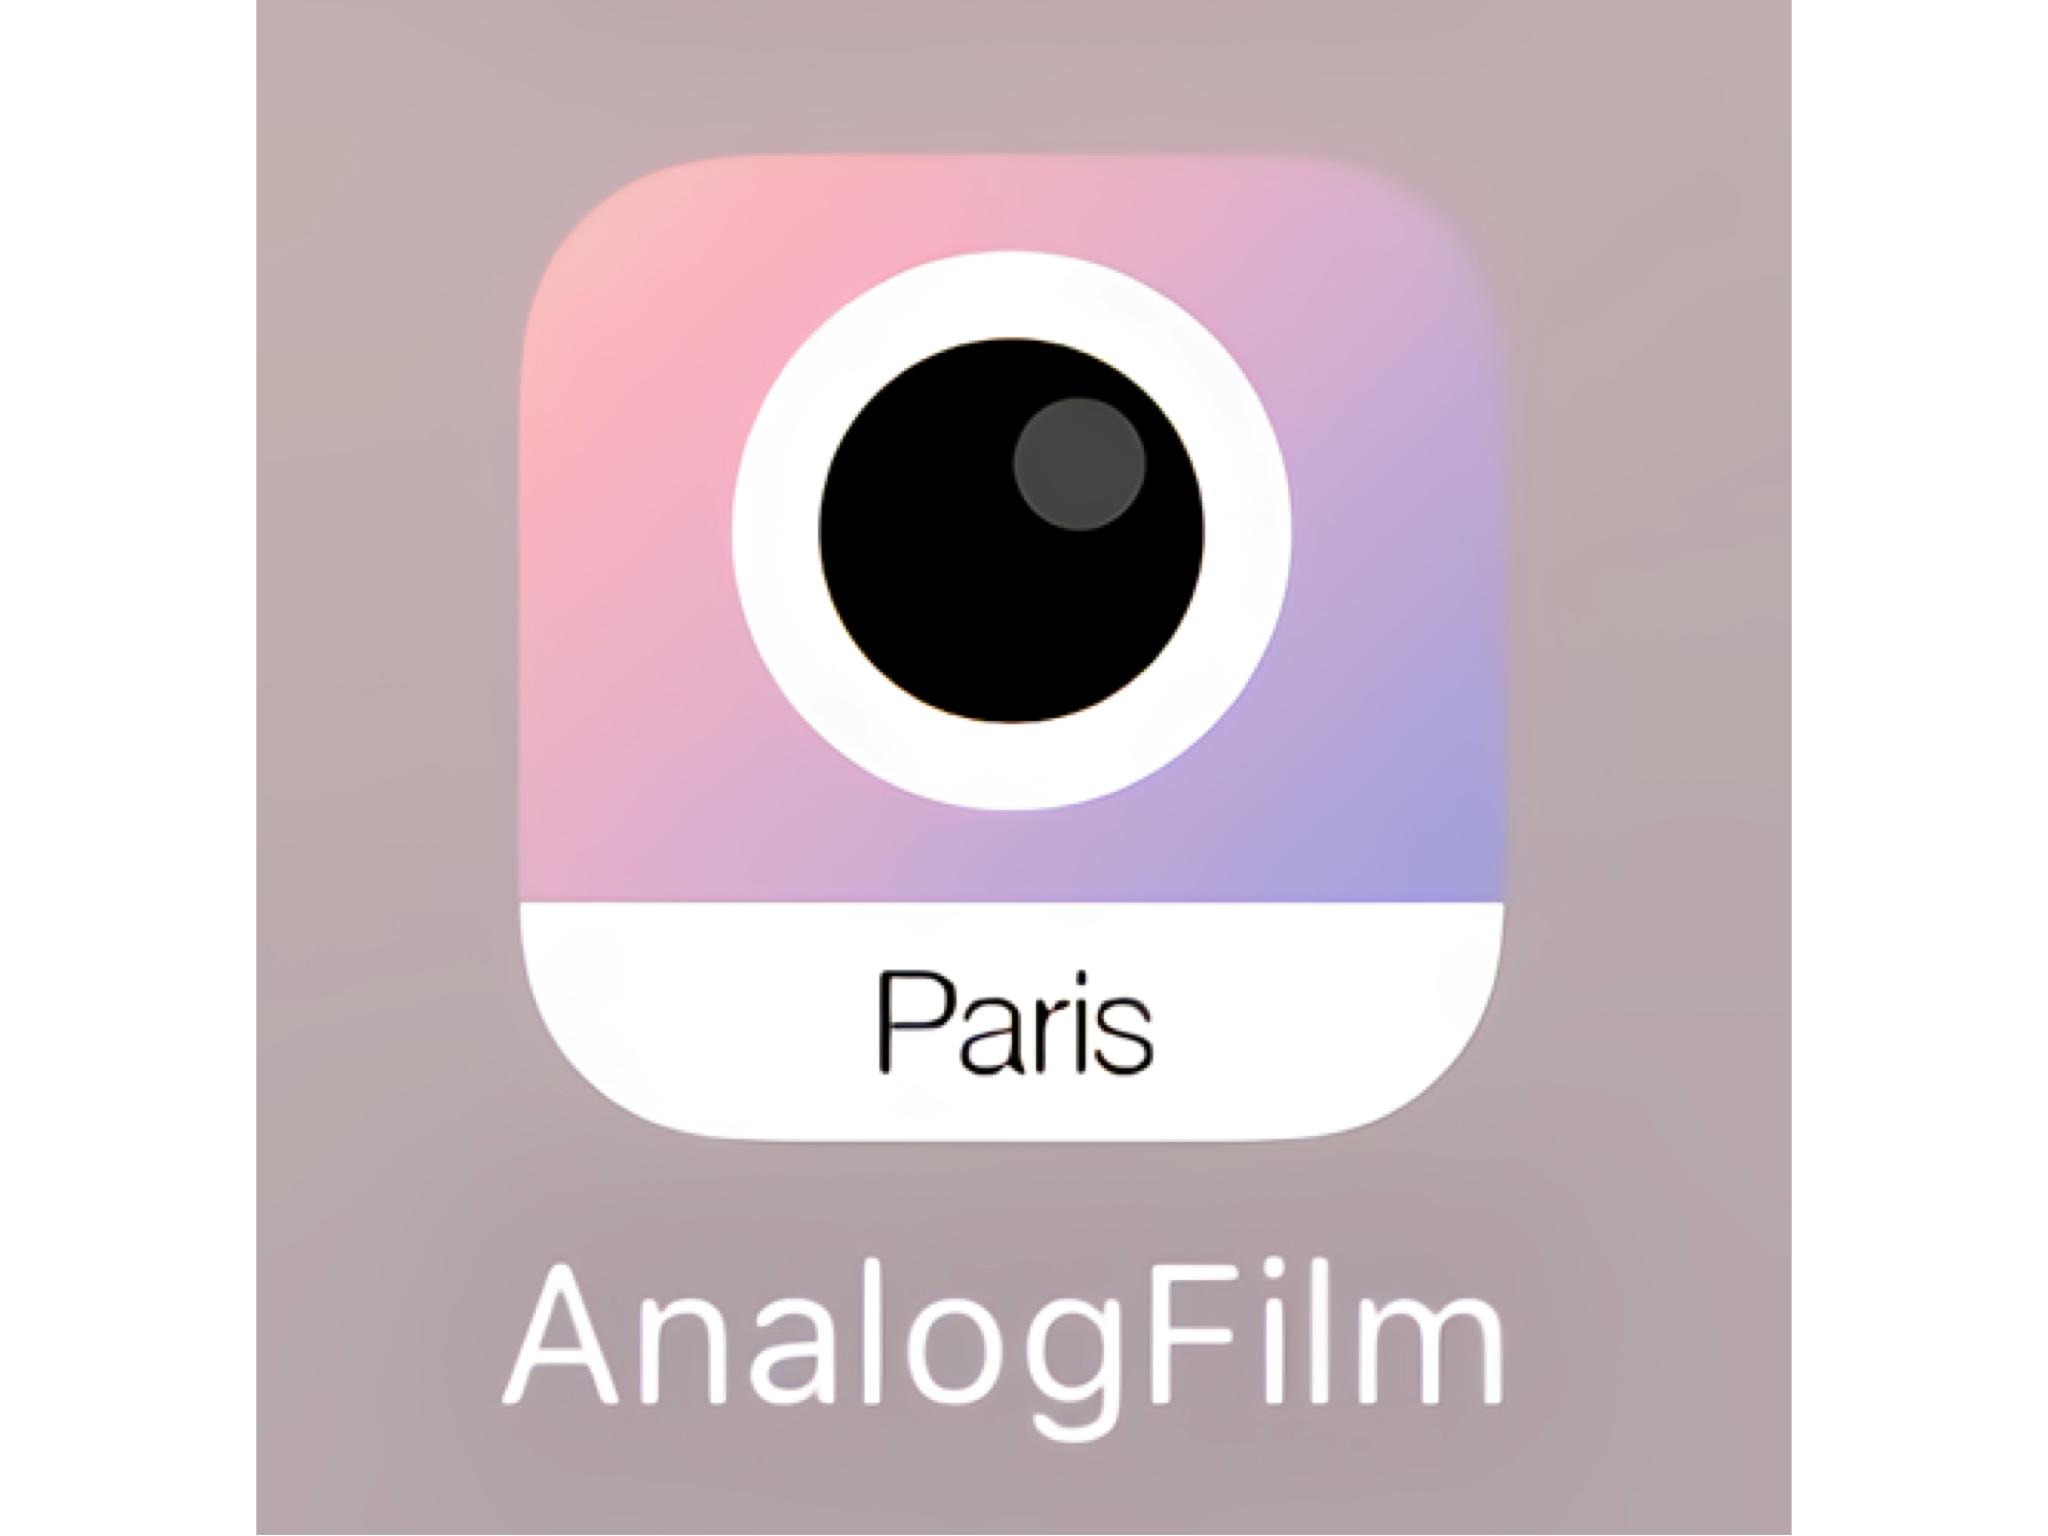 AnalaoFilm Parisアプリの画像